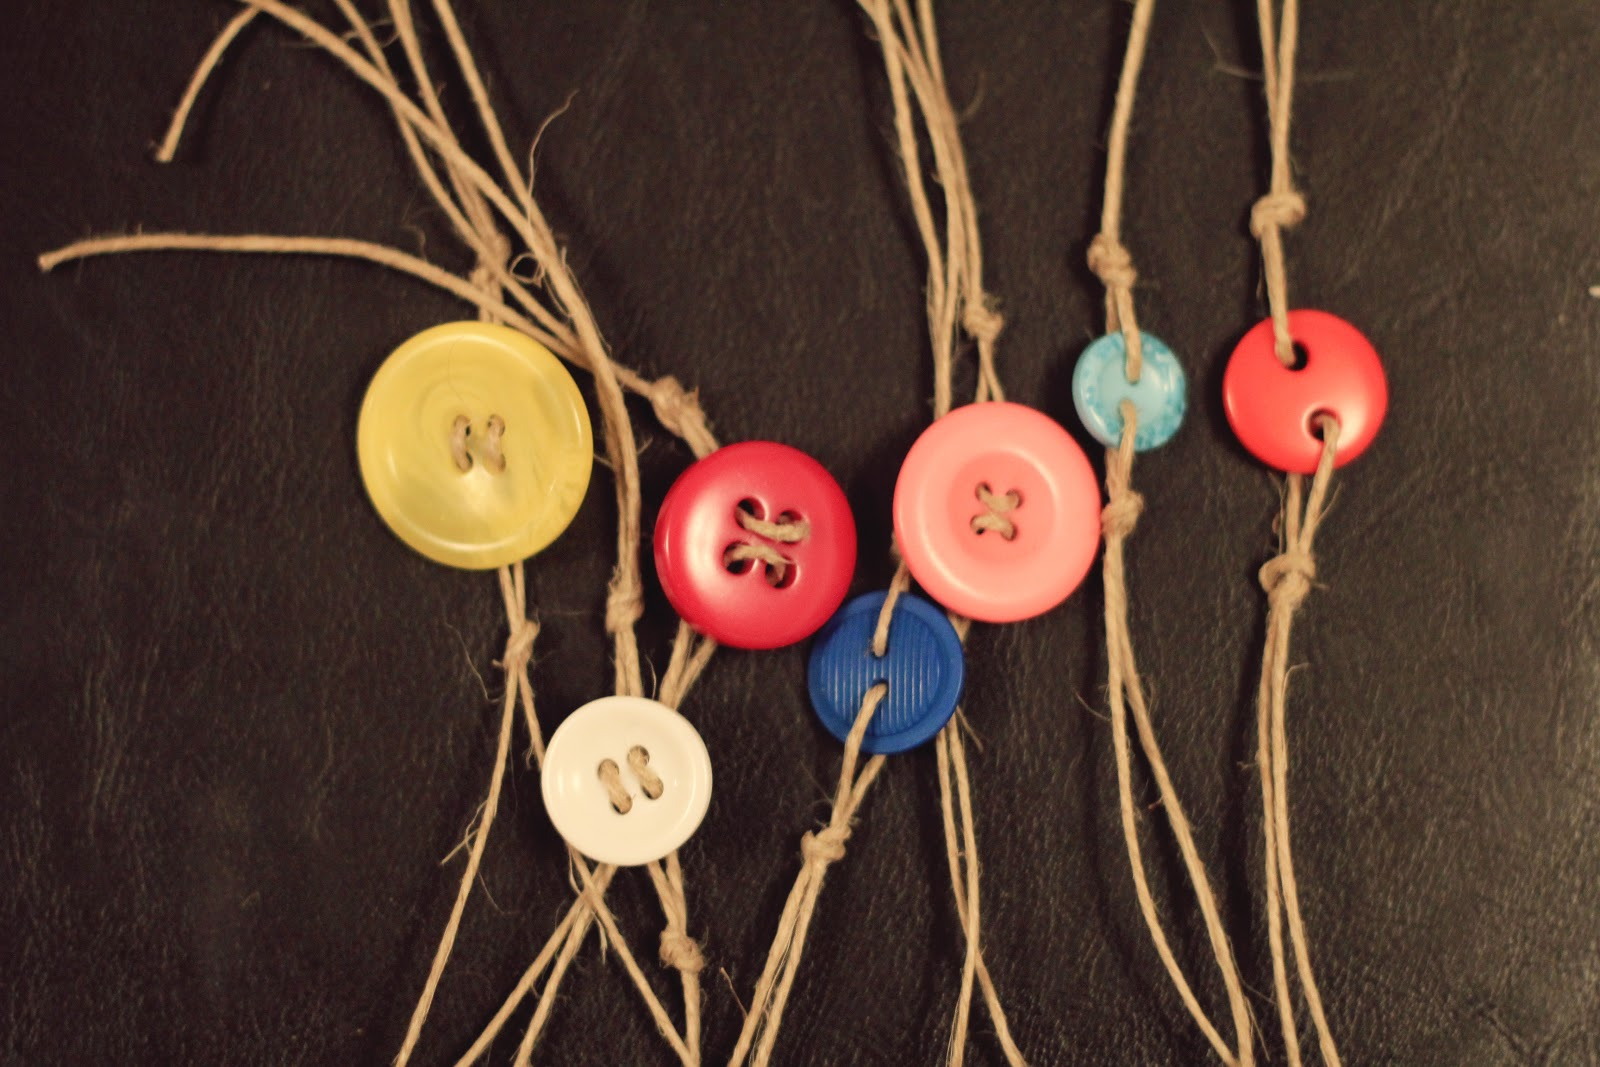 sassafras button bracelets diy project for kids